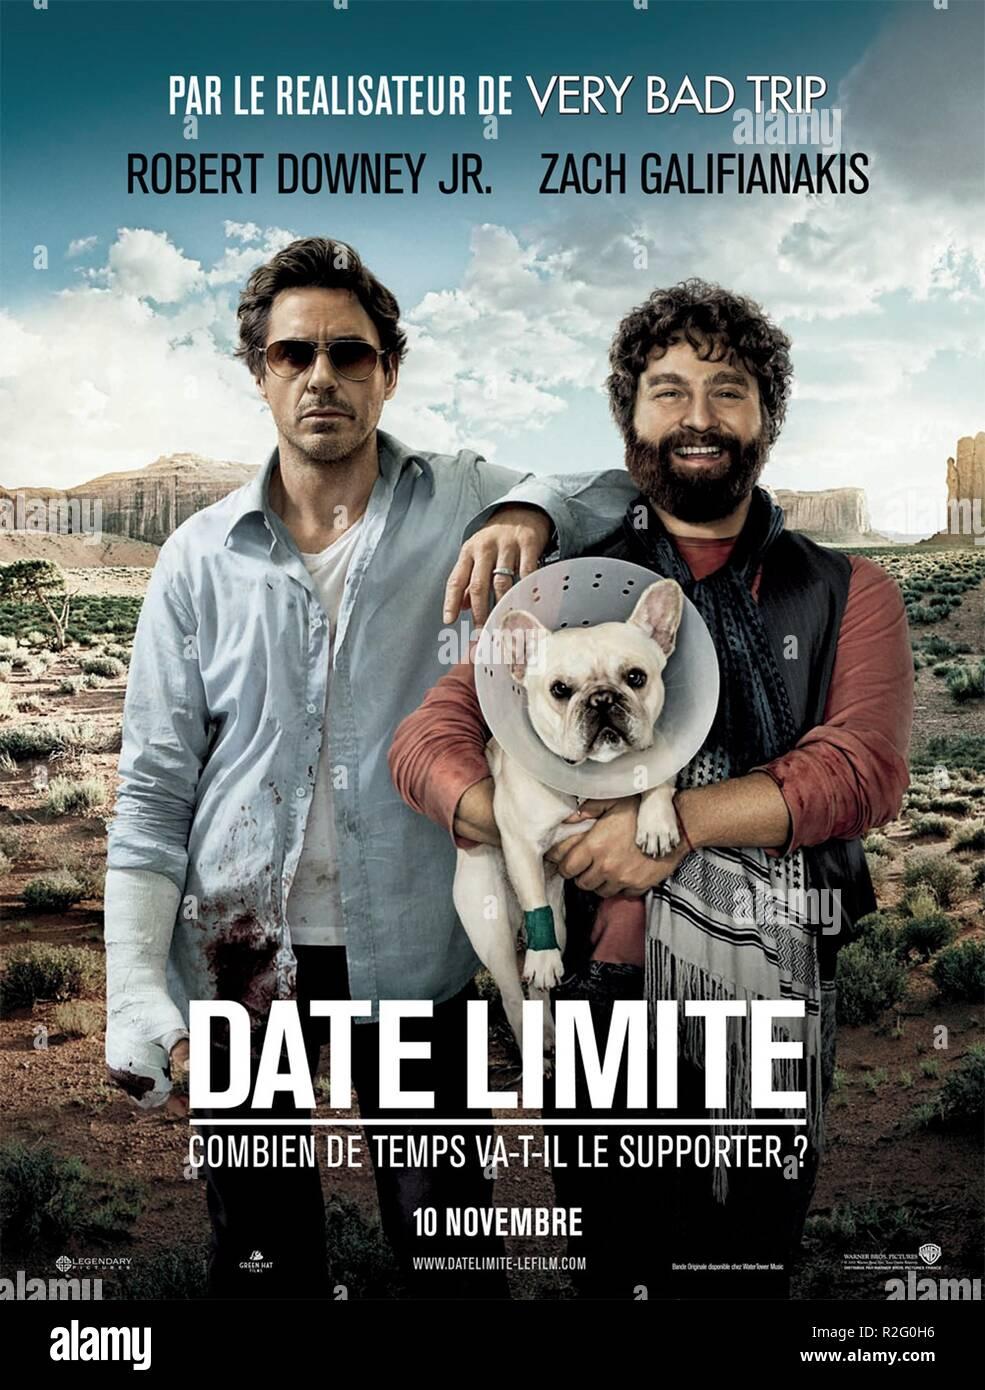 Due Date Year 2010 Usa Director Todd Phillips Robert Downey Jr Zach Galifianakis Movie Poster Fr Stock Photo Alamy